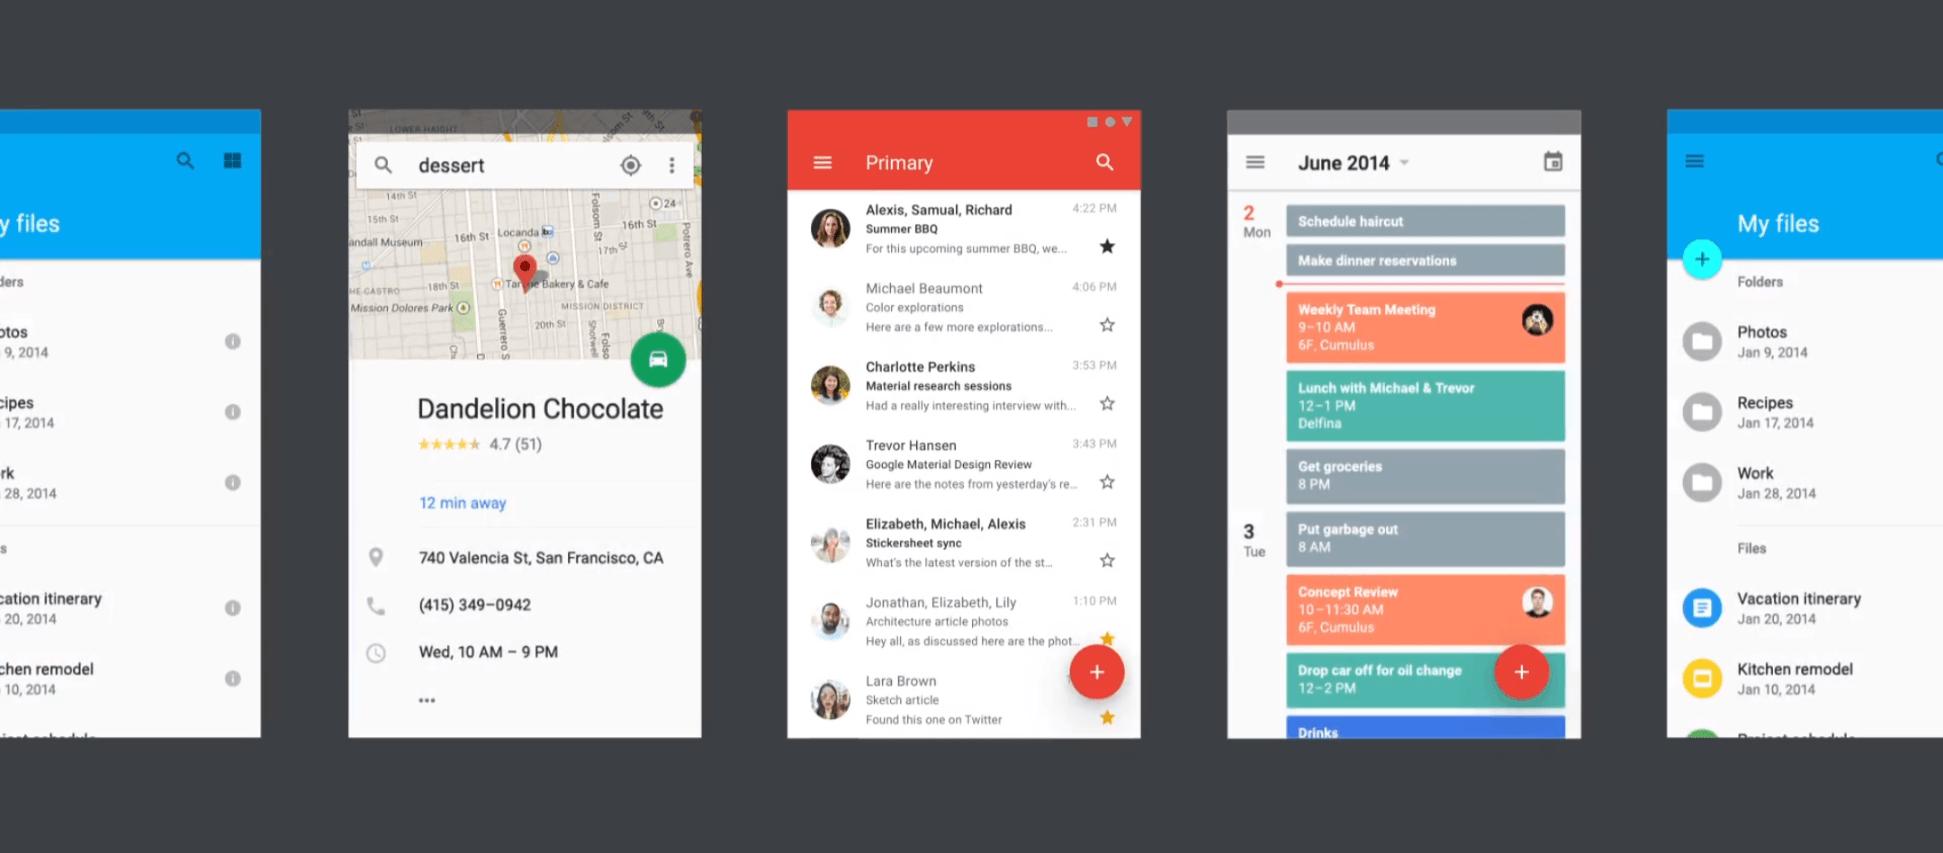 Nadchodzą Wiadomości na Androida v3.5, a w nich tryb ciemny oraz Material Design 25